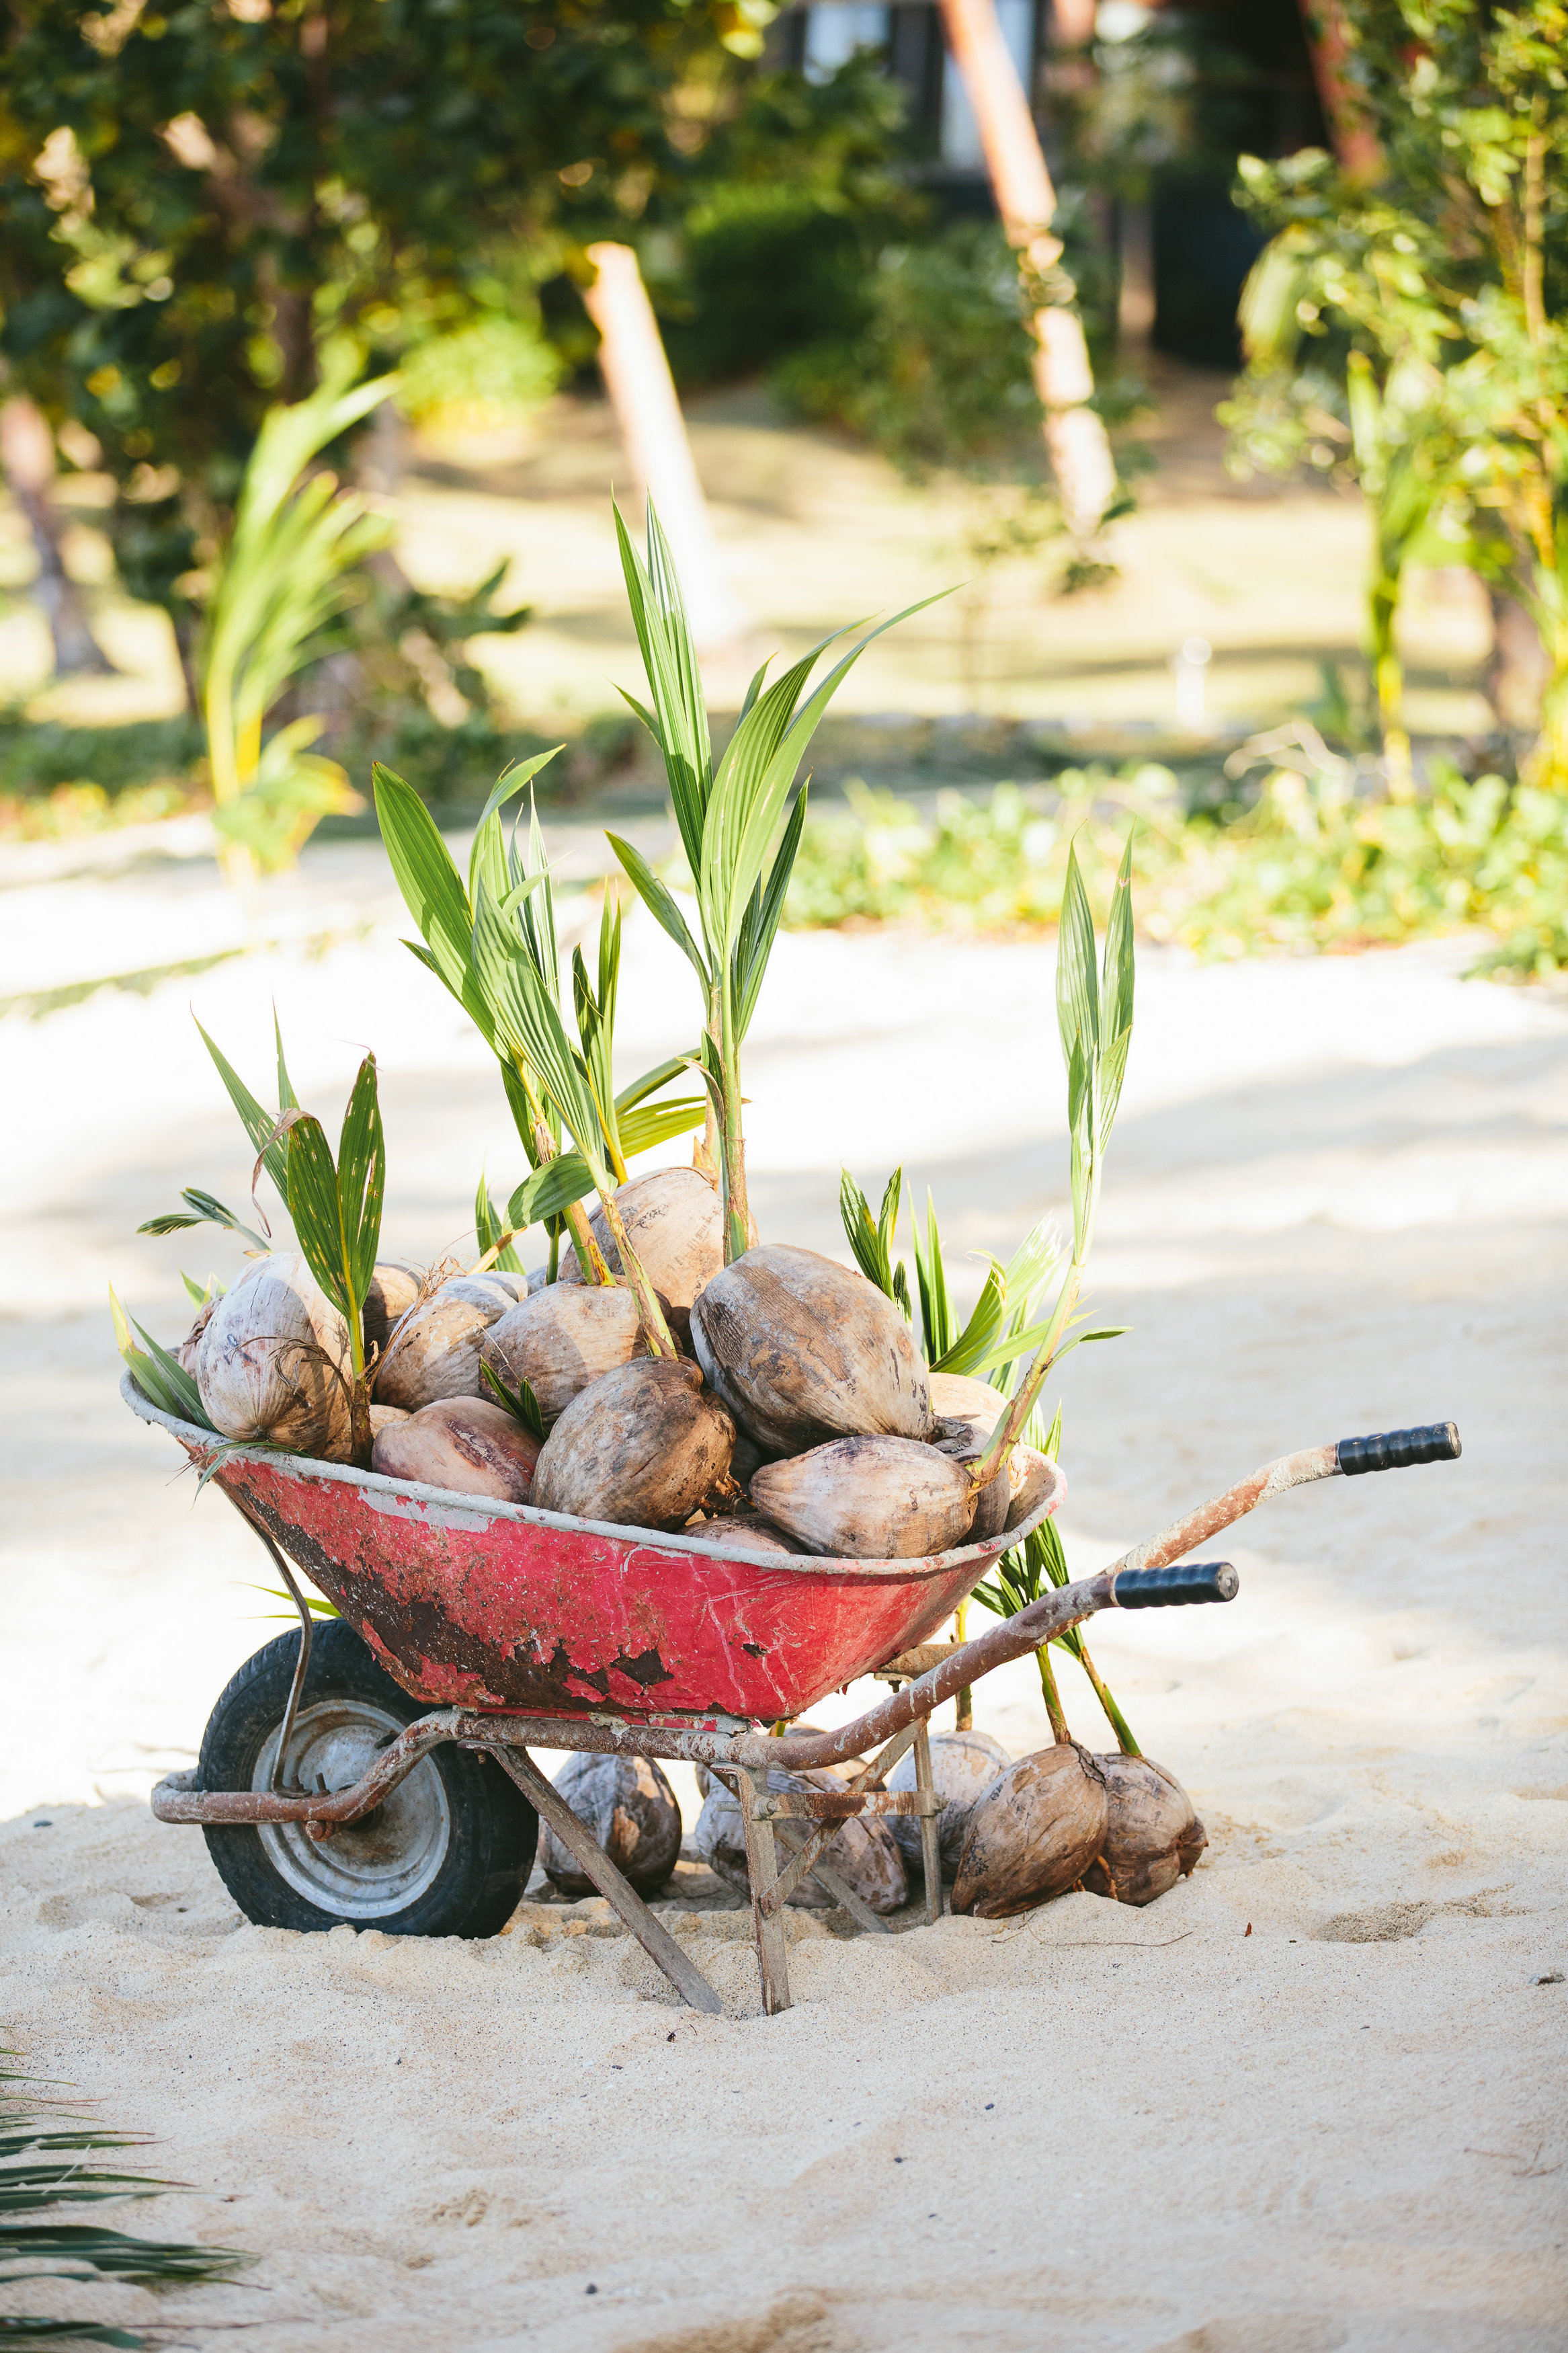 Fiji Wedding Decorations - The Remote Resort Fiji Islands - Coconuts